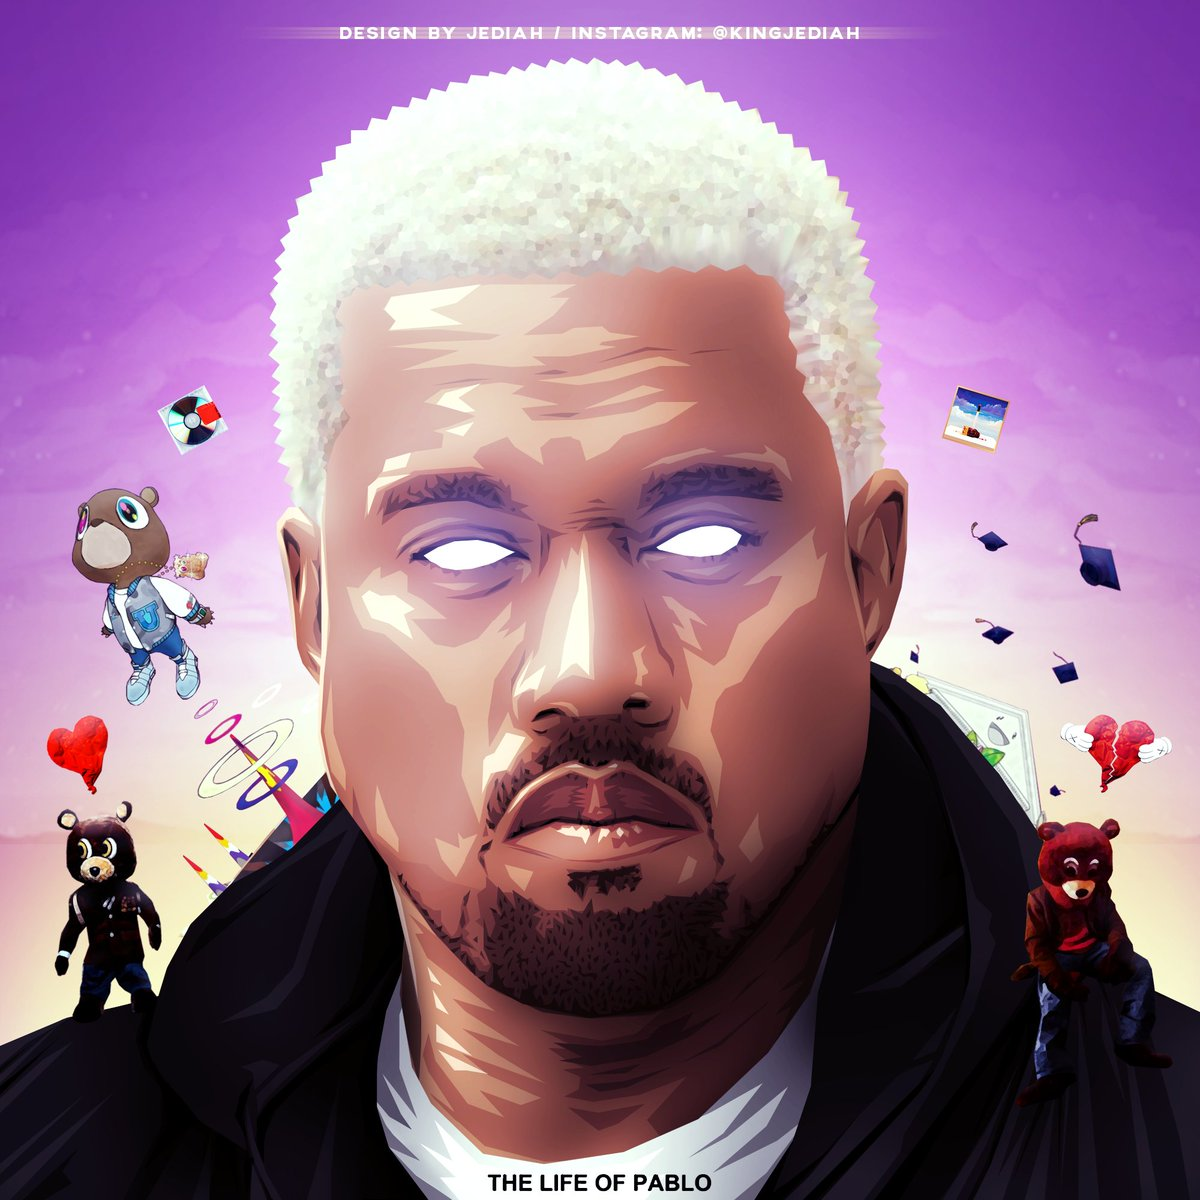 Watch additionally Lil Pumps Gucci Gang Halseys Bad Love Enter Top 40 Hot 100 together with Lil Uzi Vert 1080x1080 1pEIwsA6ea0qp9ddnsG83OGhuOCiJNscFhu5KnnihPA additionally Watch moreover 832910905822187520. on cartoon lil uzi vert wallpaper